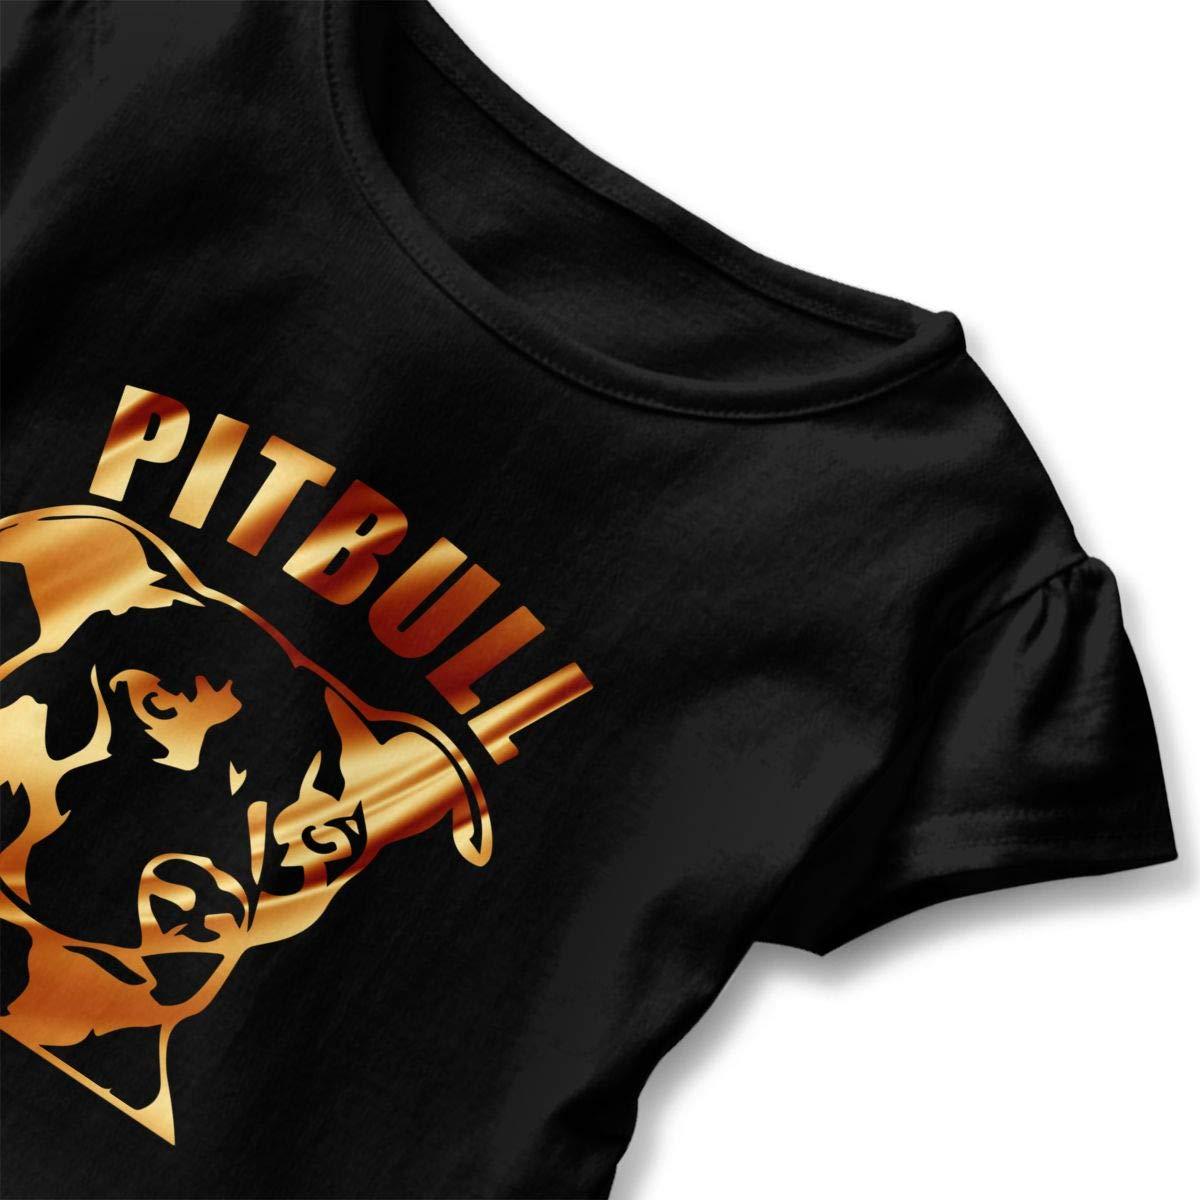 CZnuen Pit Bull Crumble Baby Girls Basic Short Puff Sleeve Round Neck Ruffle T-Shirt